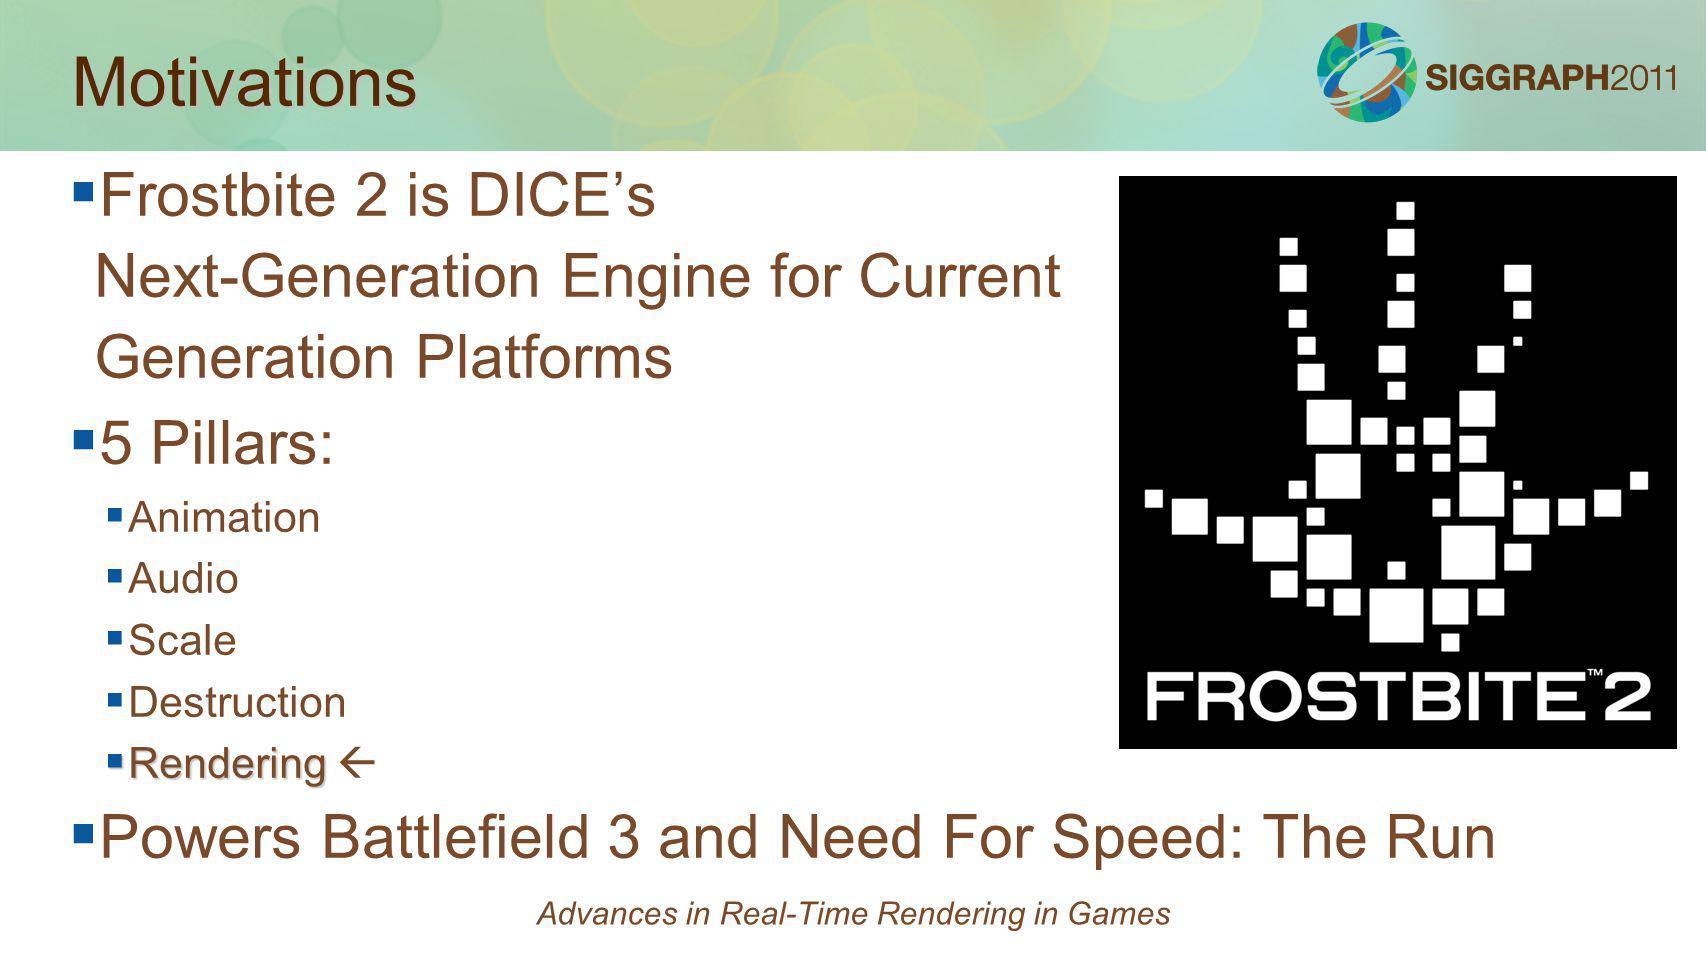 Motivations Frostbite 2 is DICEs Next-Generation Engine for Current Generation Platforms 5 Pillars: Animation Audio Scale Destruction Rendering Render